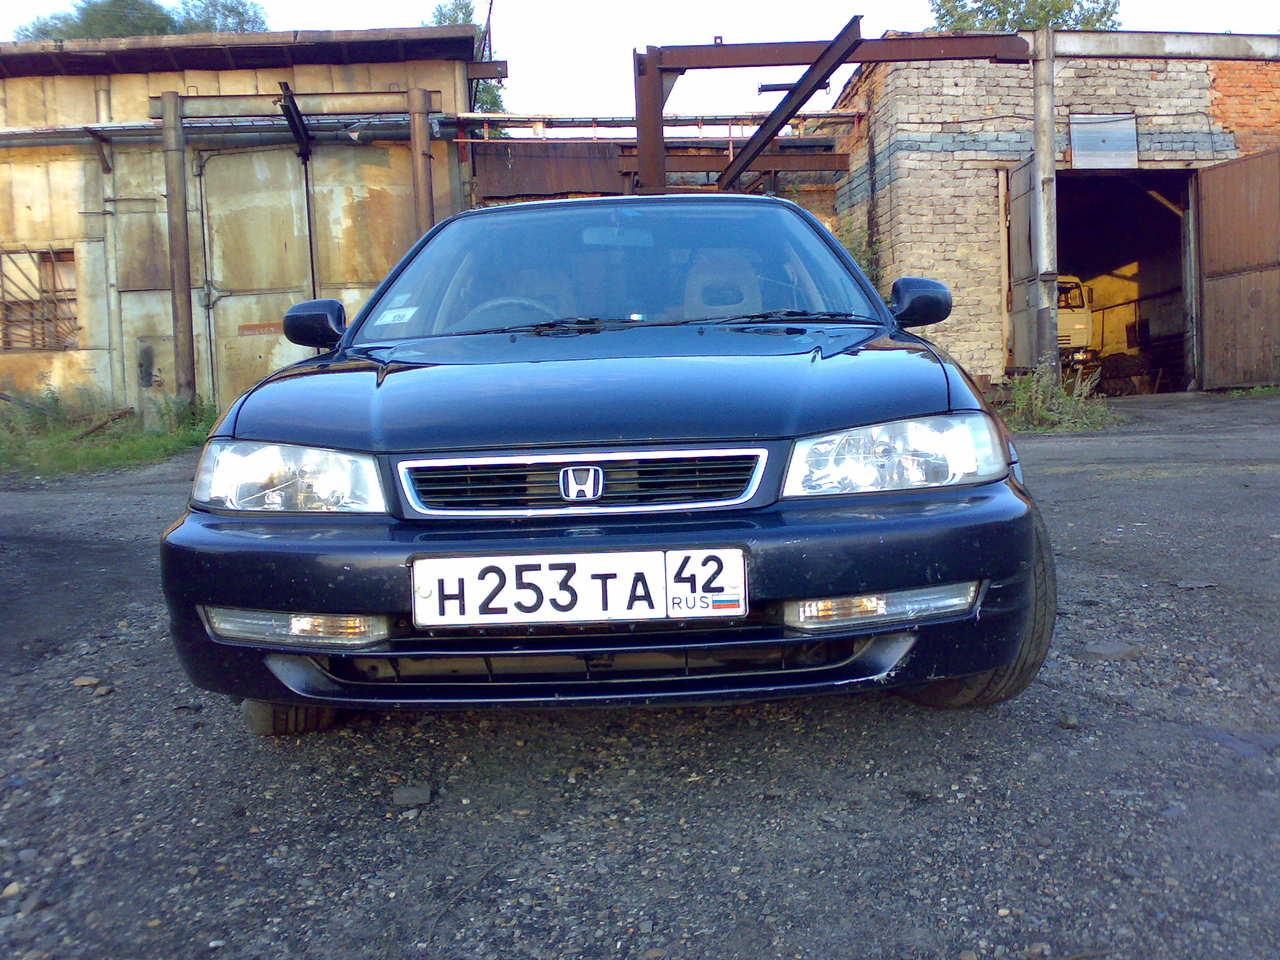 f5282447b6b0 1999 Honda Domani For Sale, 1600cc., Gasoline, FF, CVT For Sale